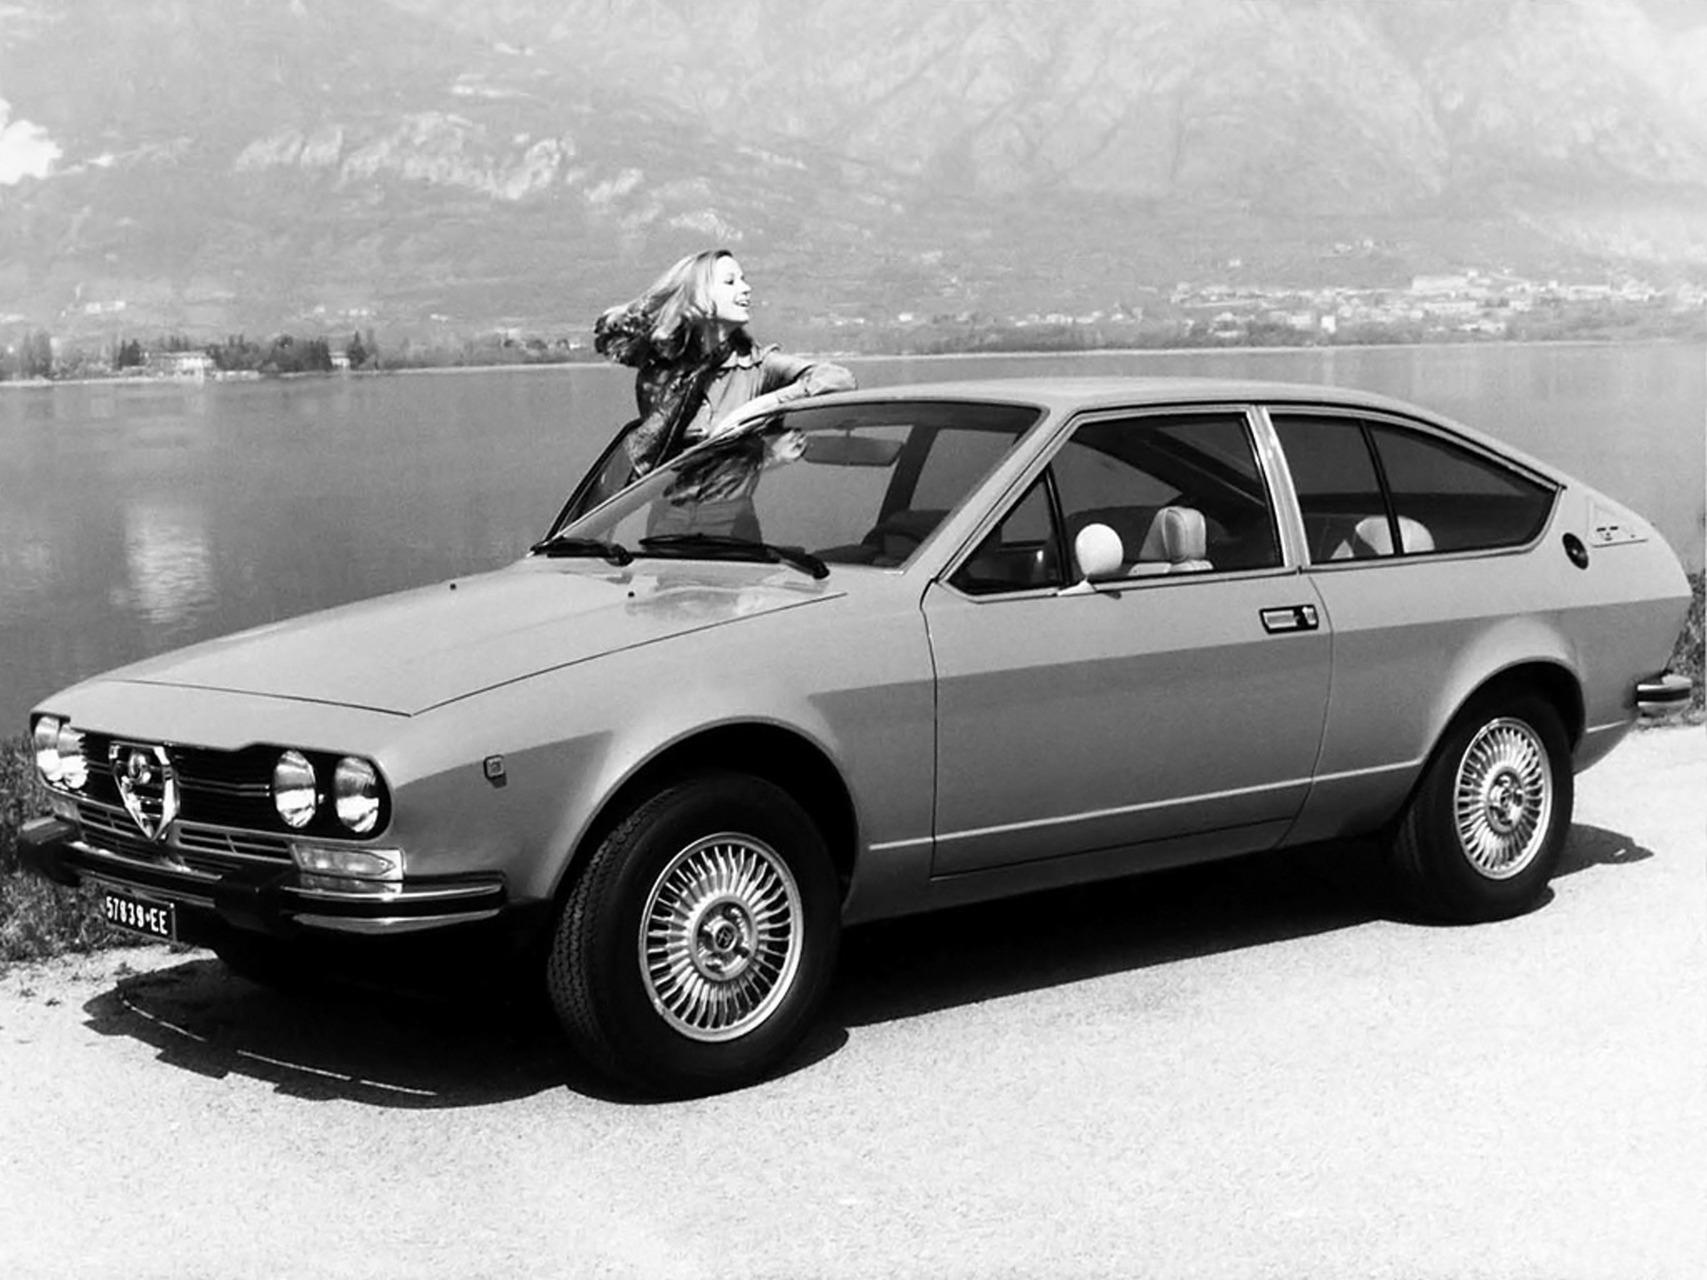 Alfa Romeo Alfetta GTV 6 2.5i